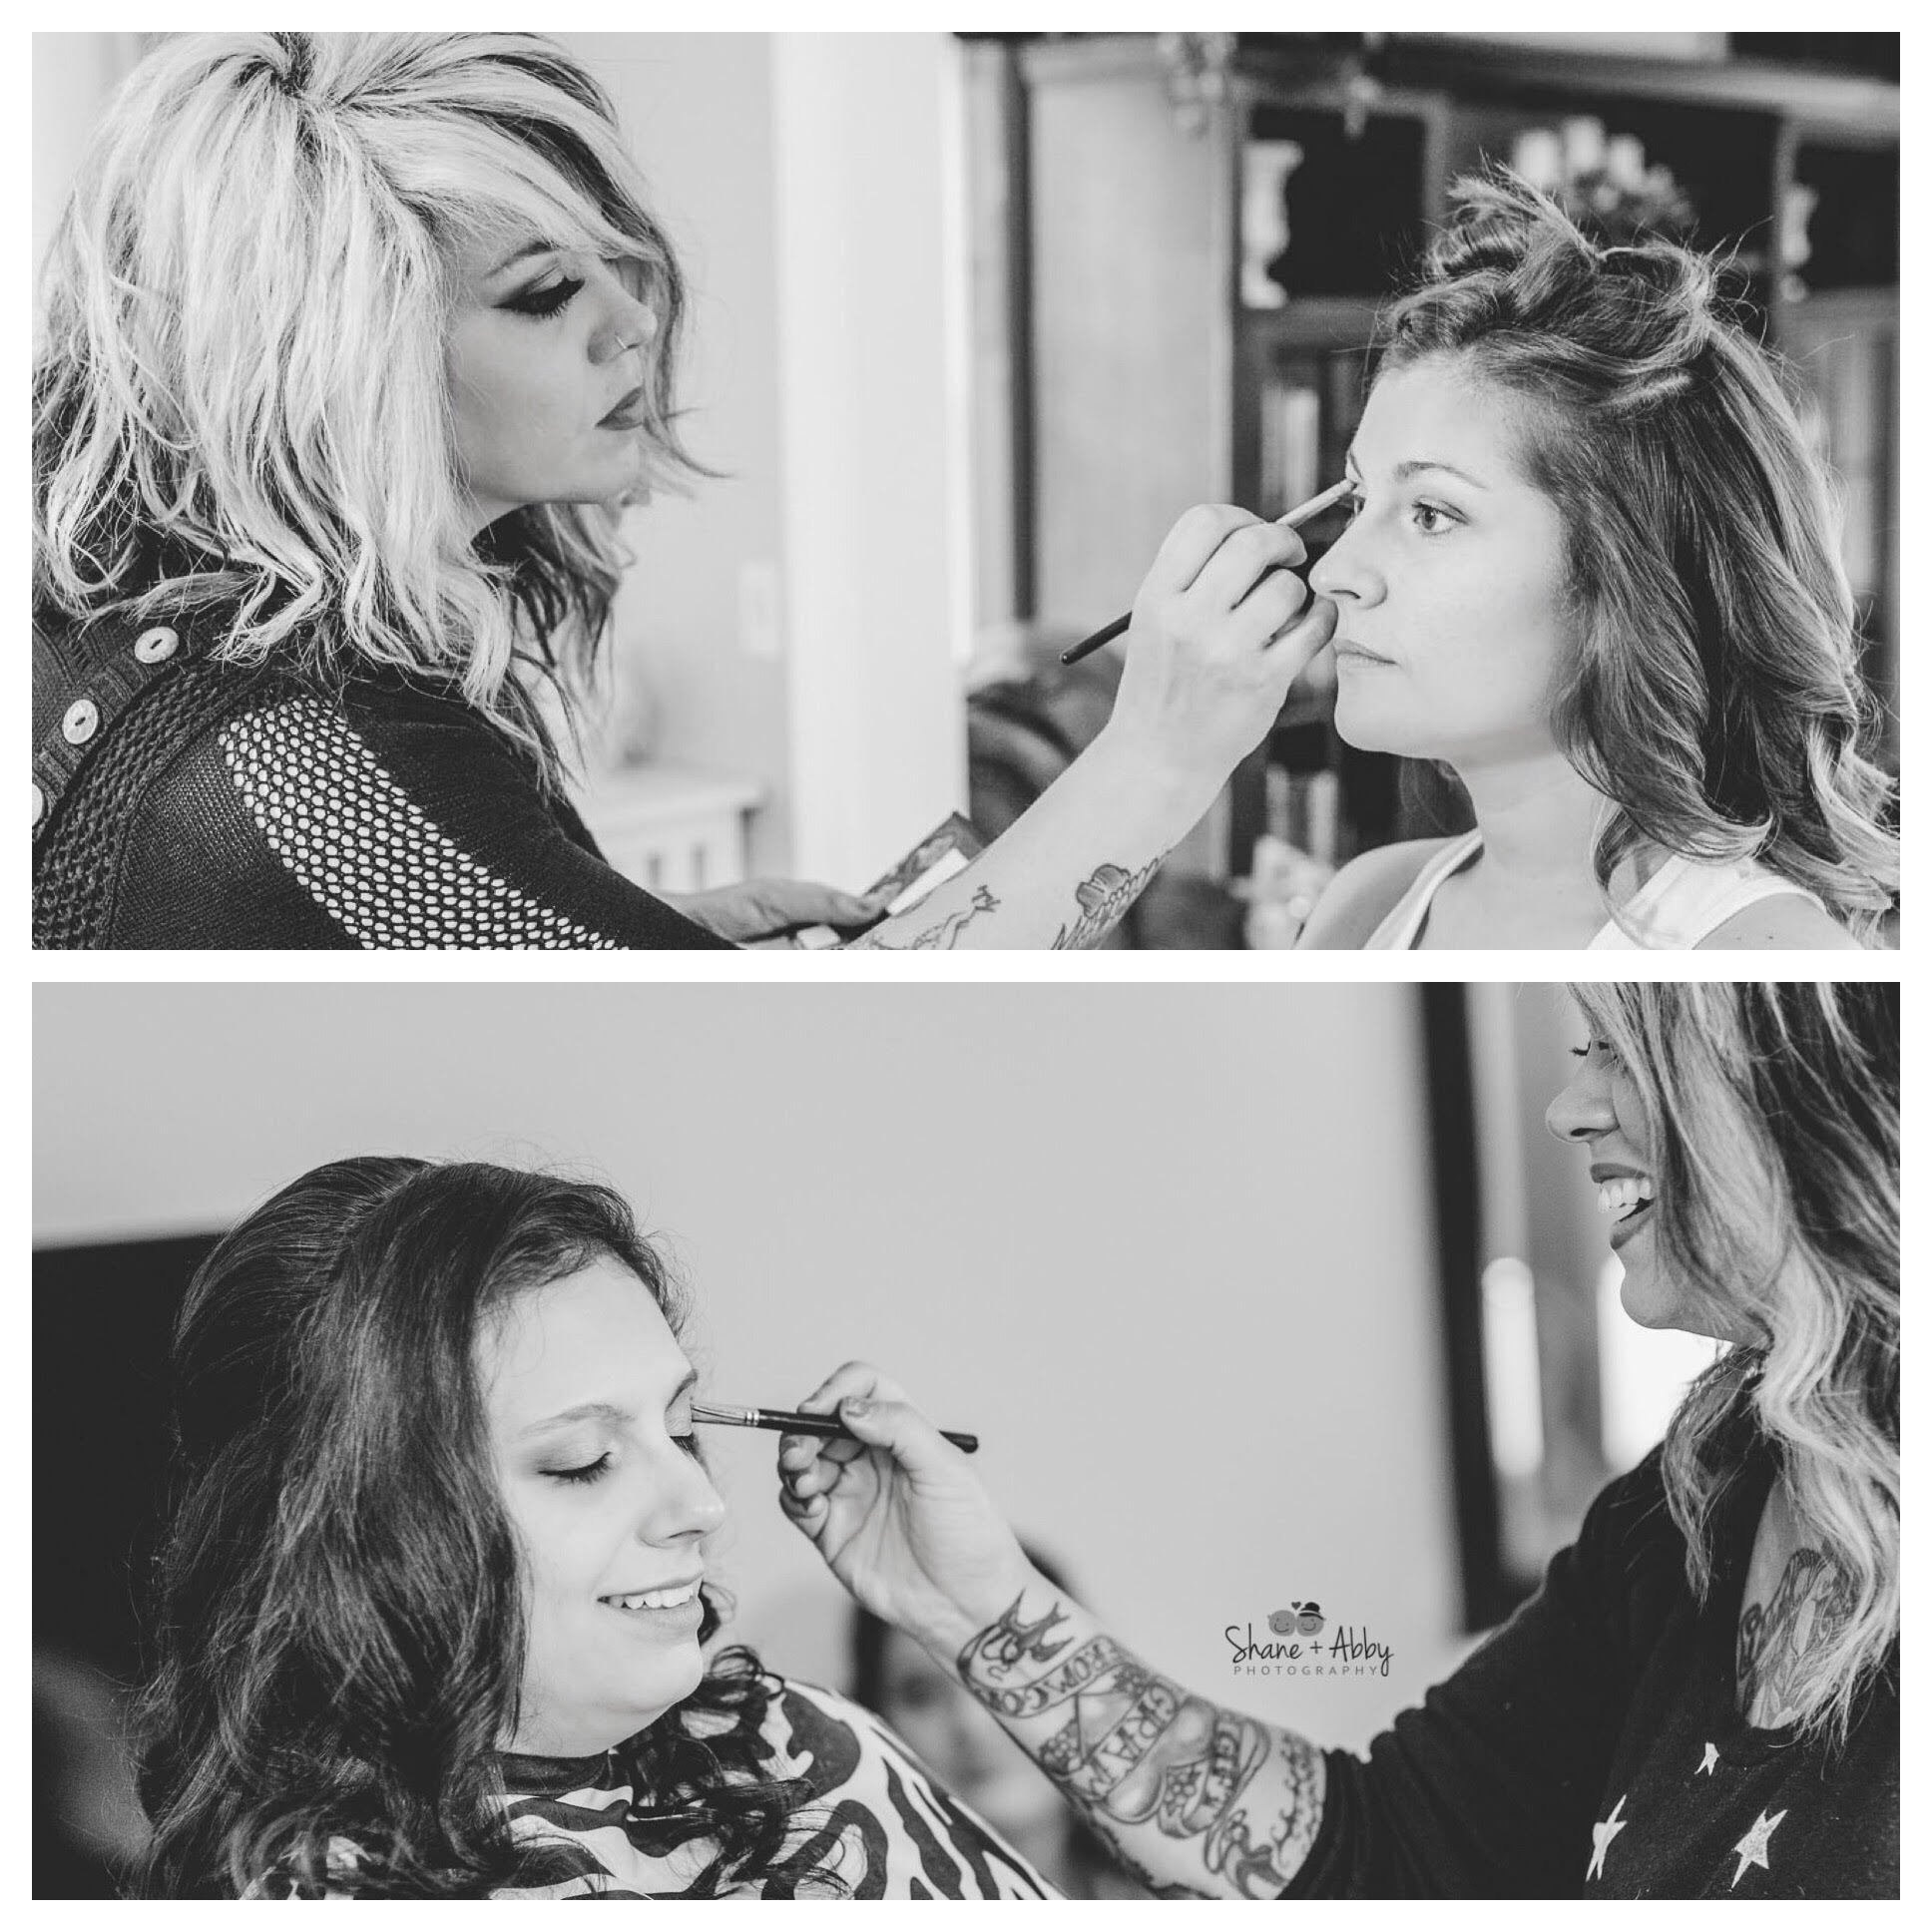 Northwest Indiana Wedding Makeup Artist - Krissy V | Northwest ...